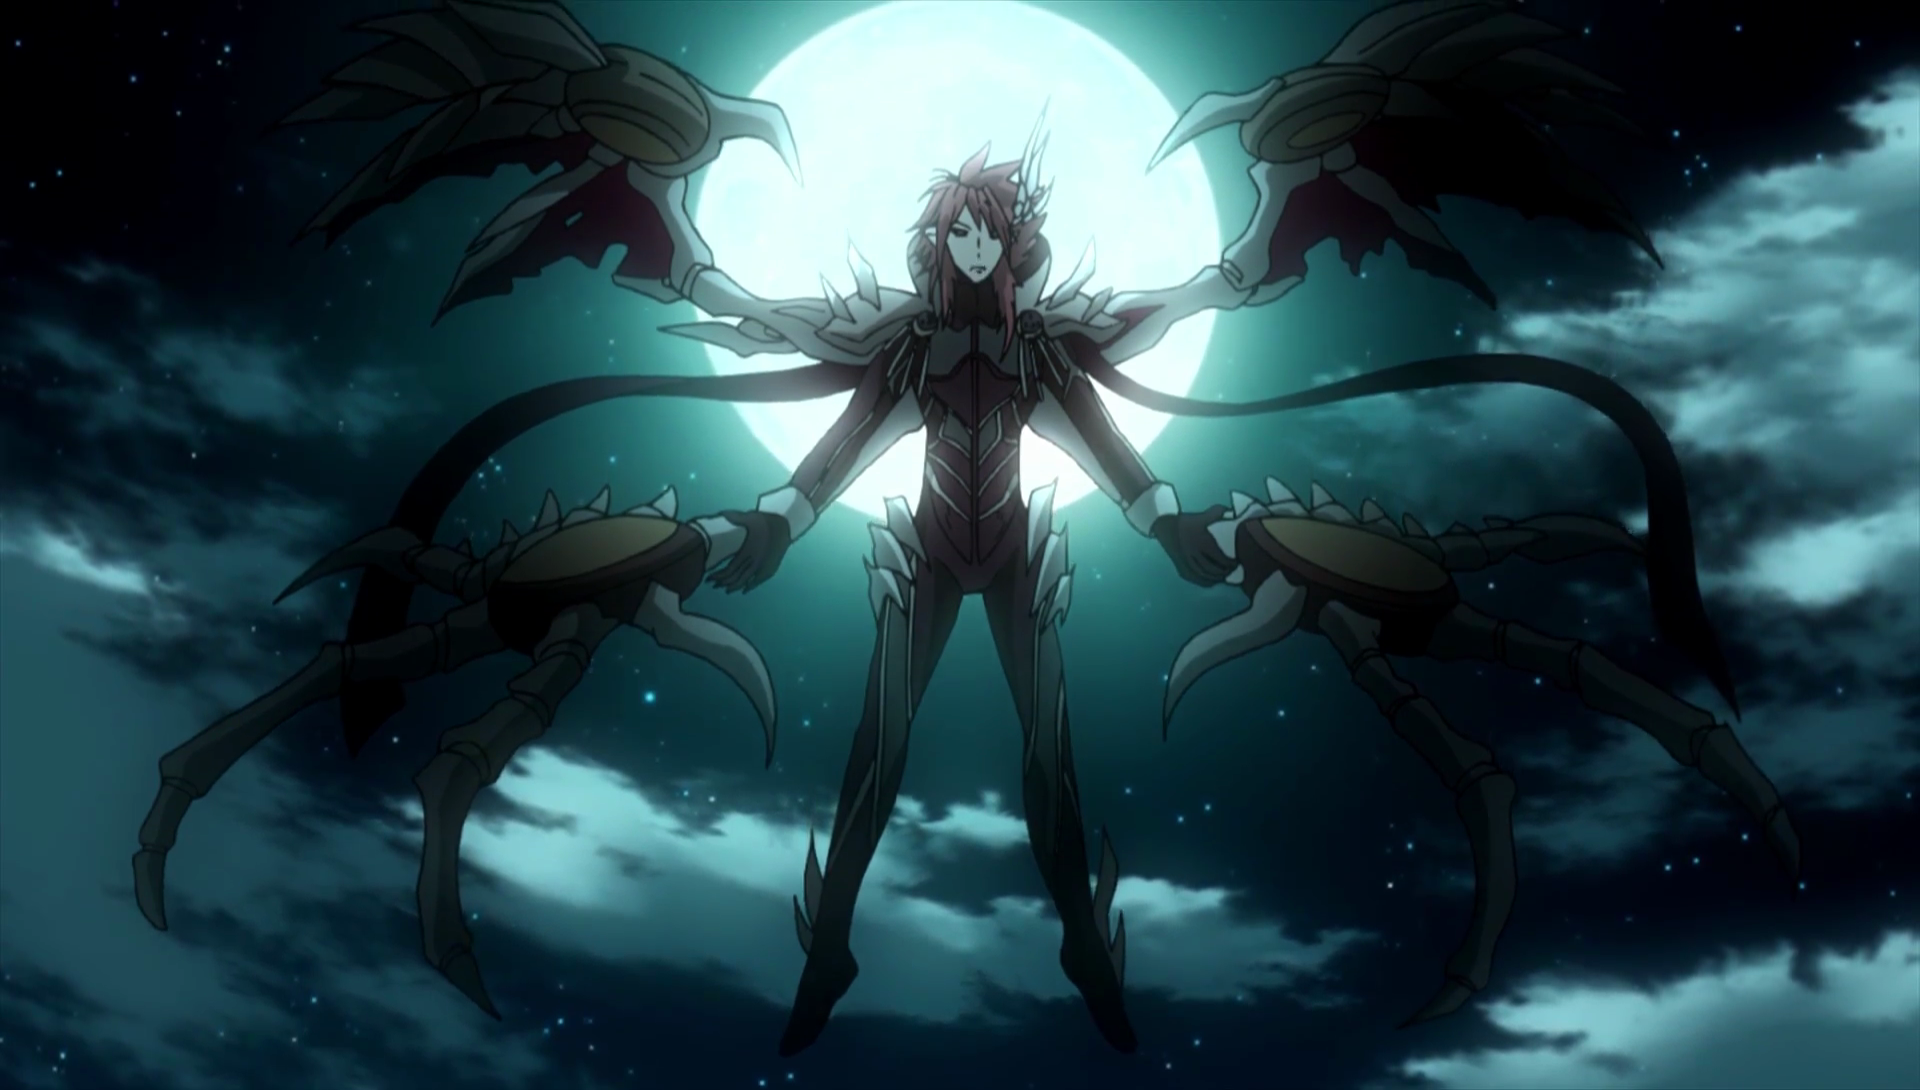 Vampir Animes